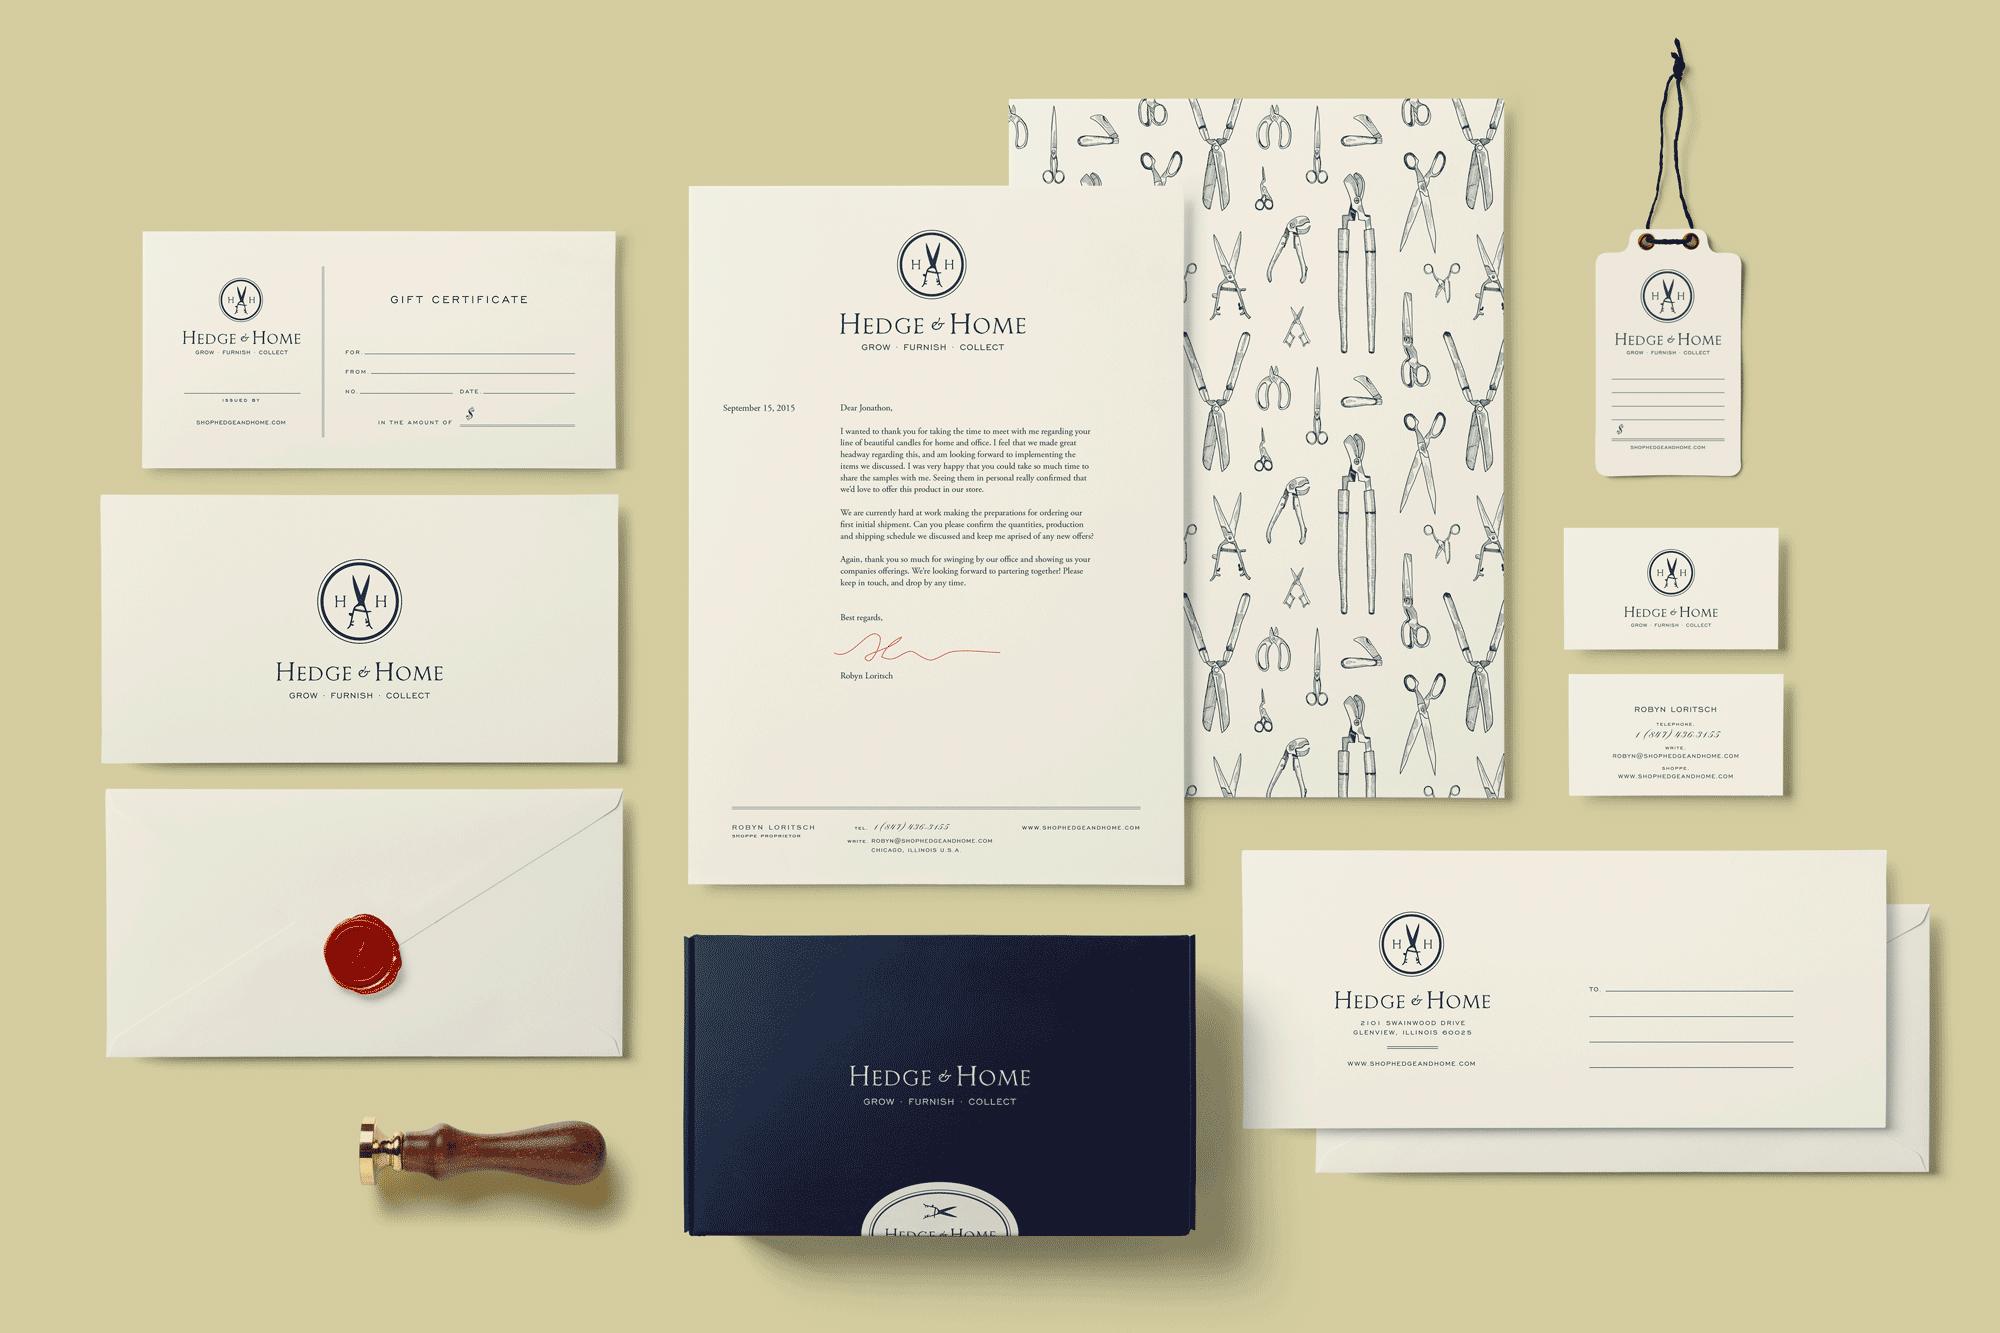 3_Hedge-and-Home_Stationery-Branding-Design_Rachelle-Sartini-Garner.png